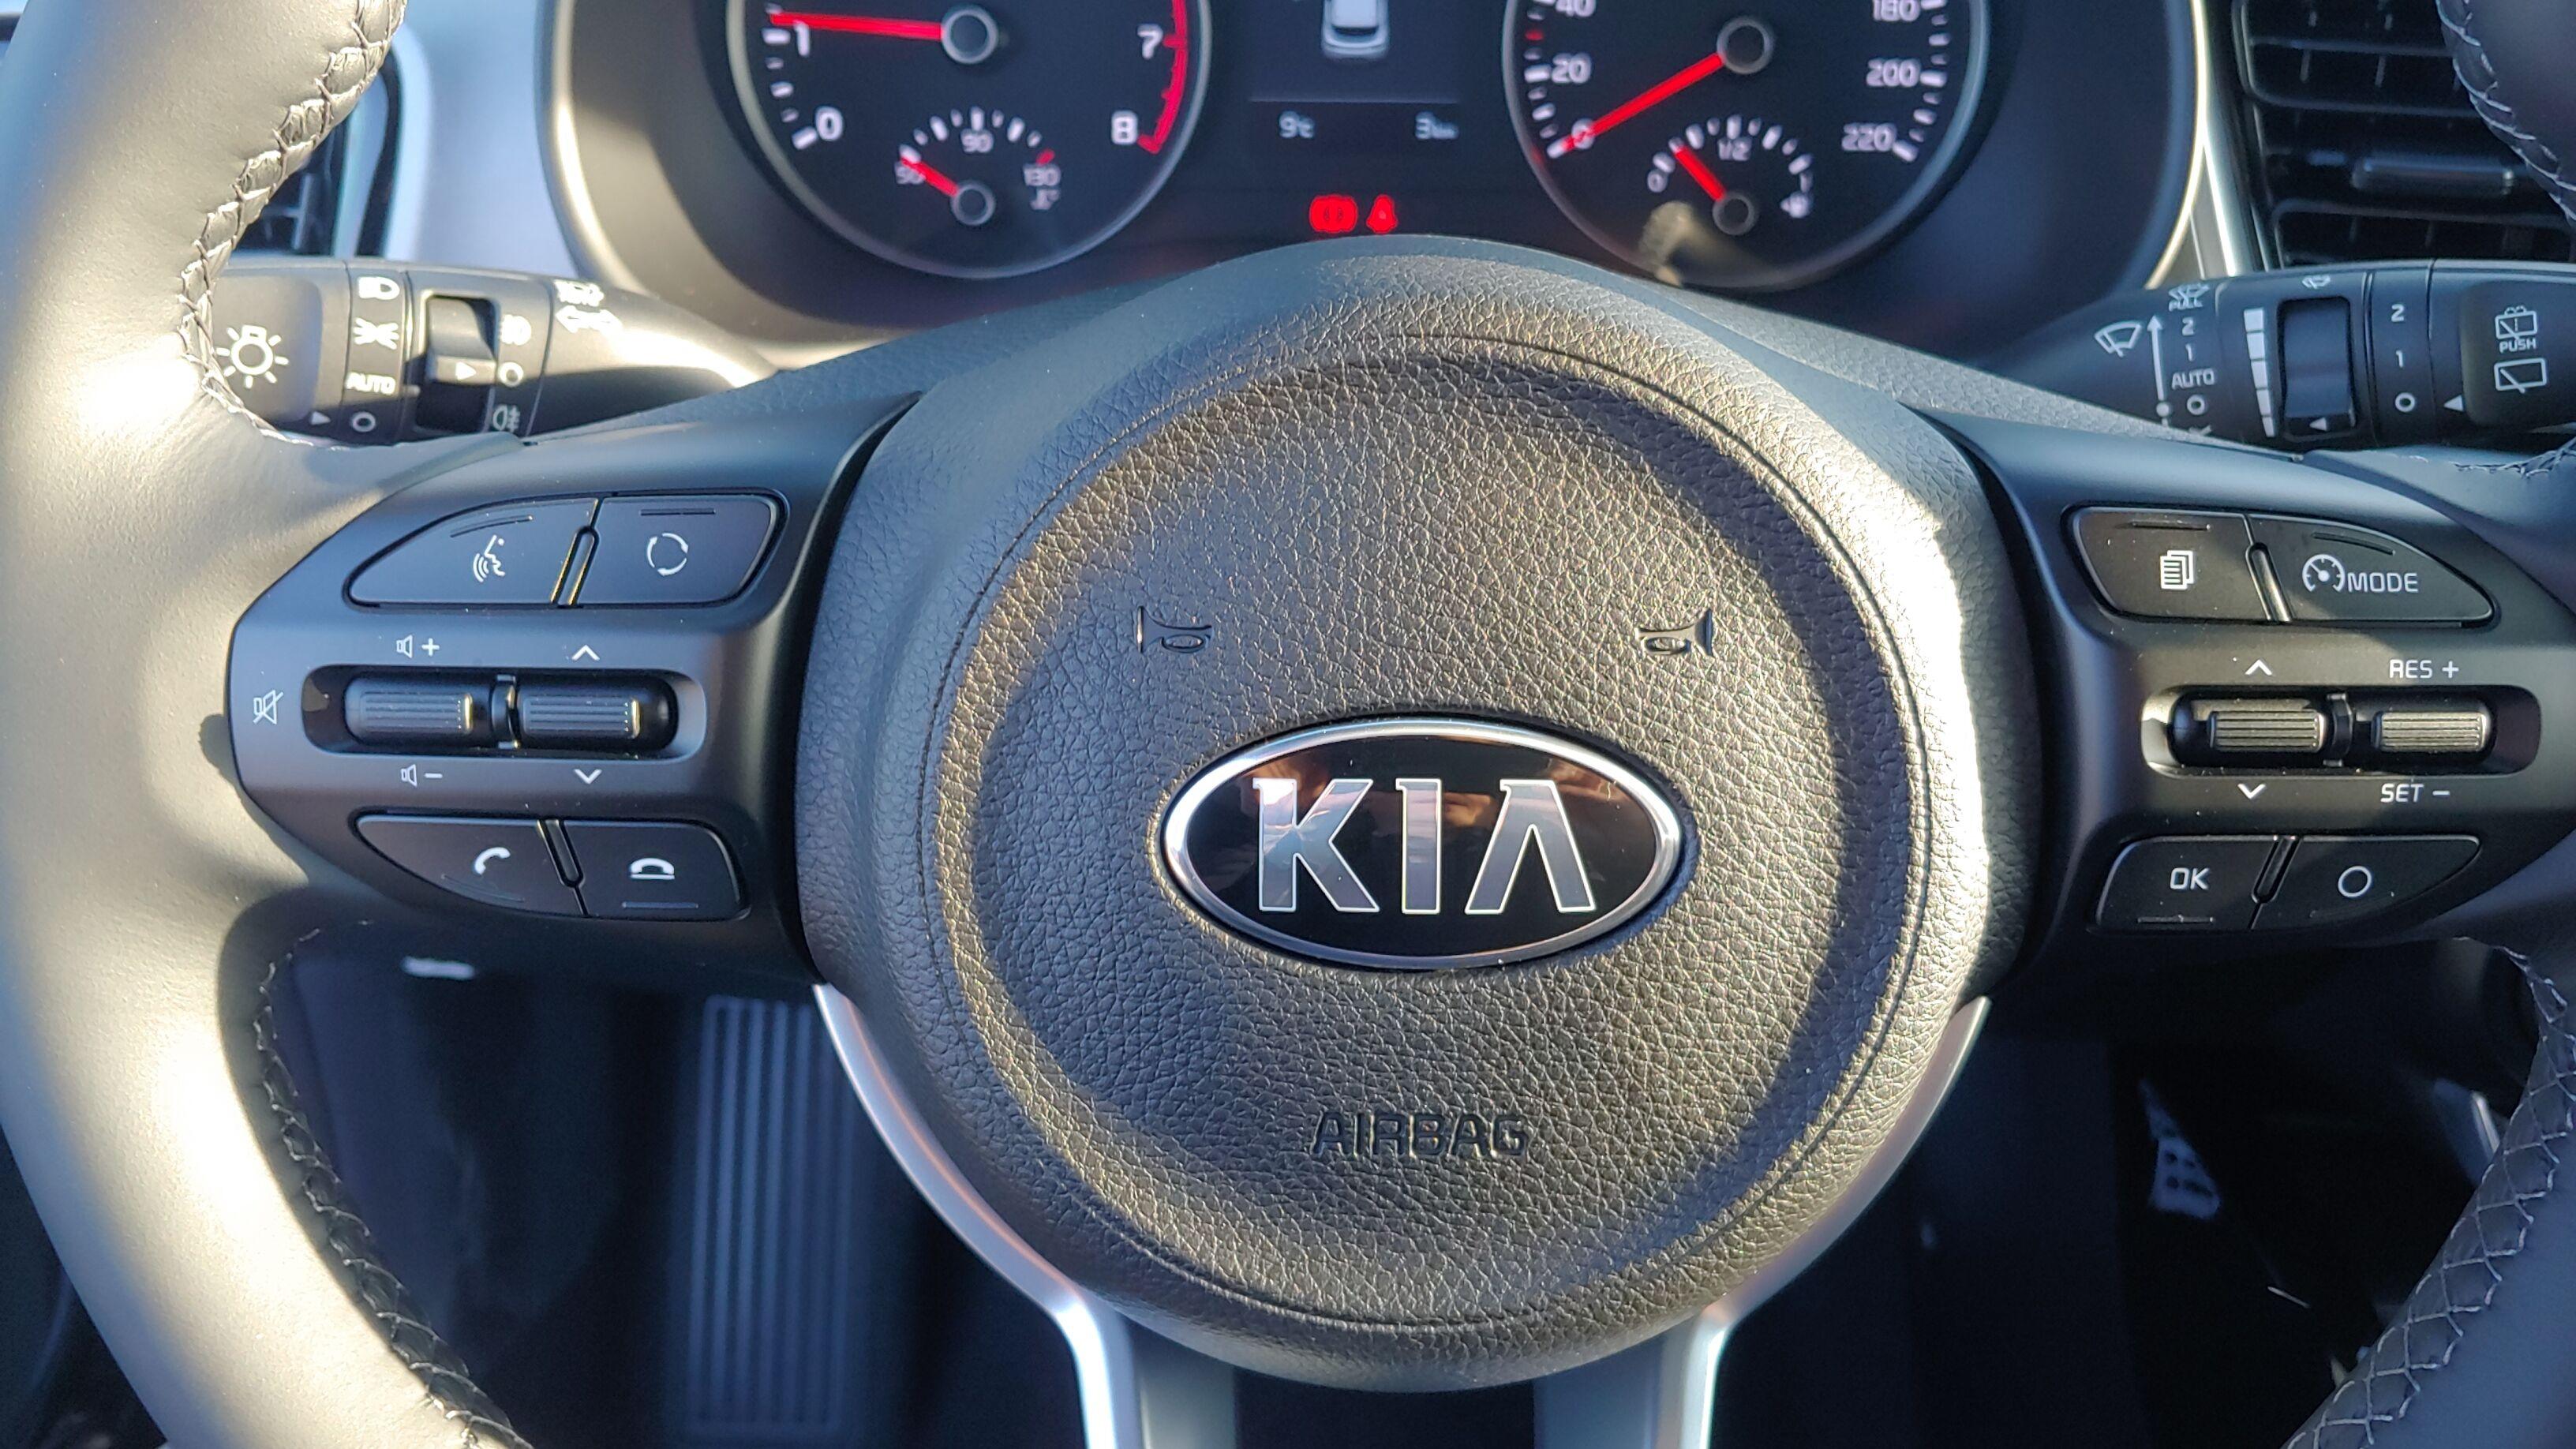 Kia Stonic 1.0 T Sense ISG / Leder /GPS / Camera | 7 jaar garantie 4/13